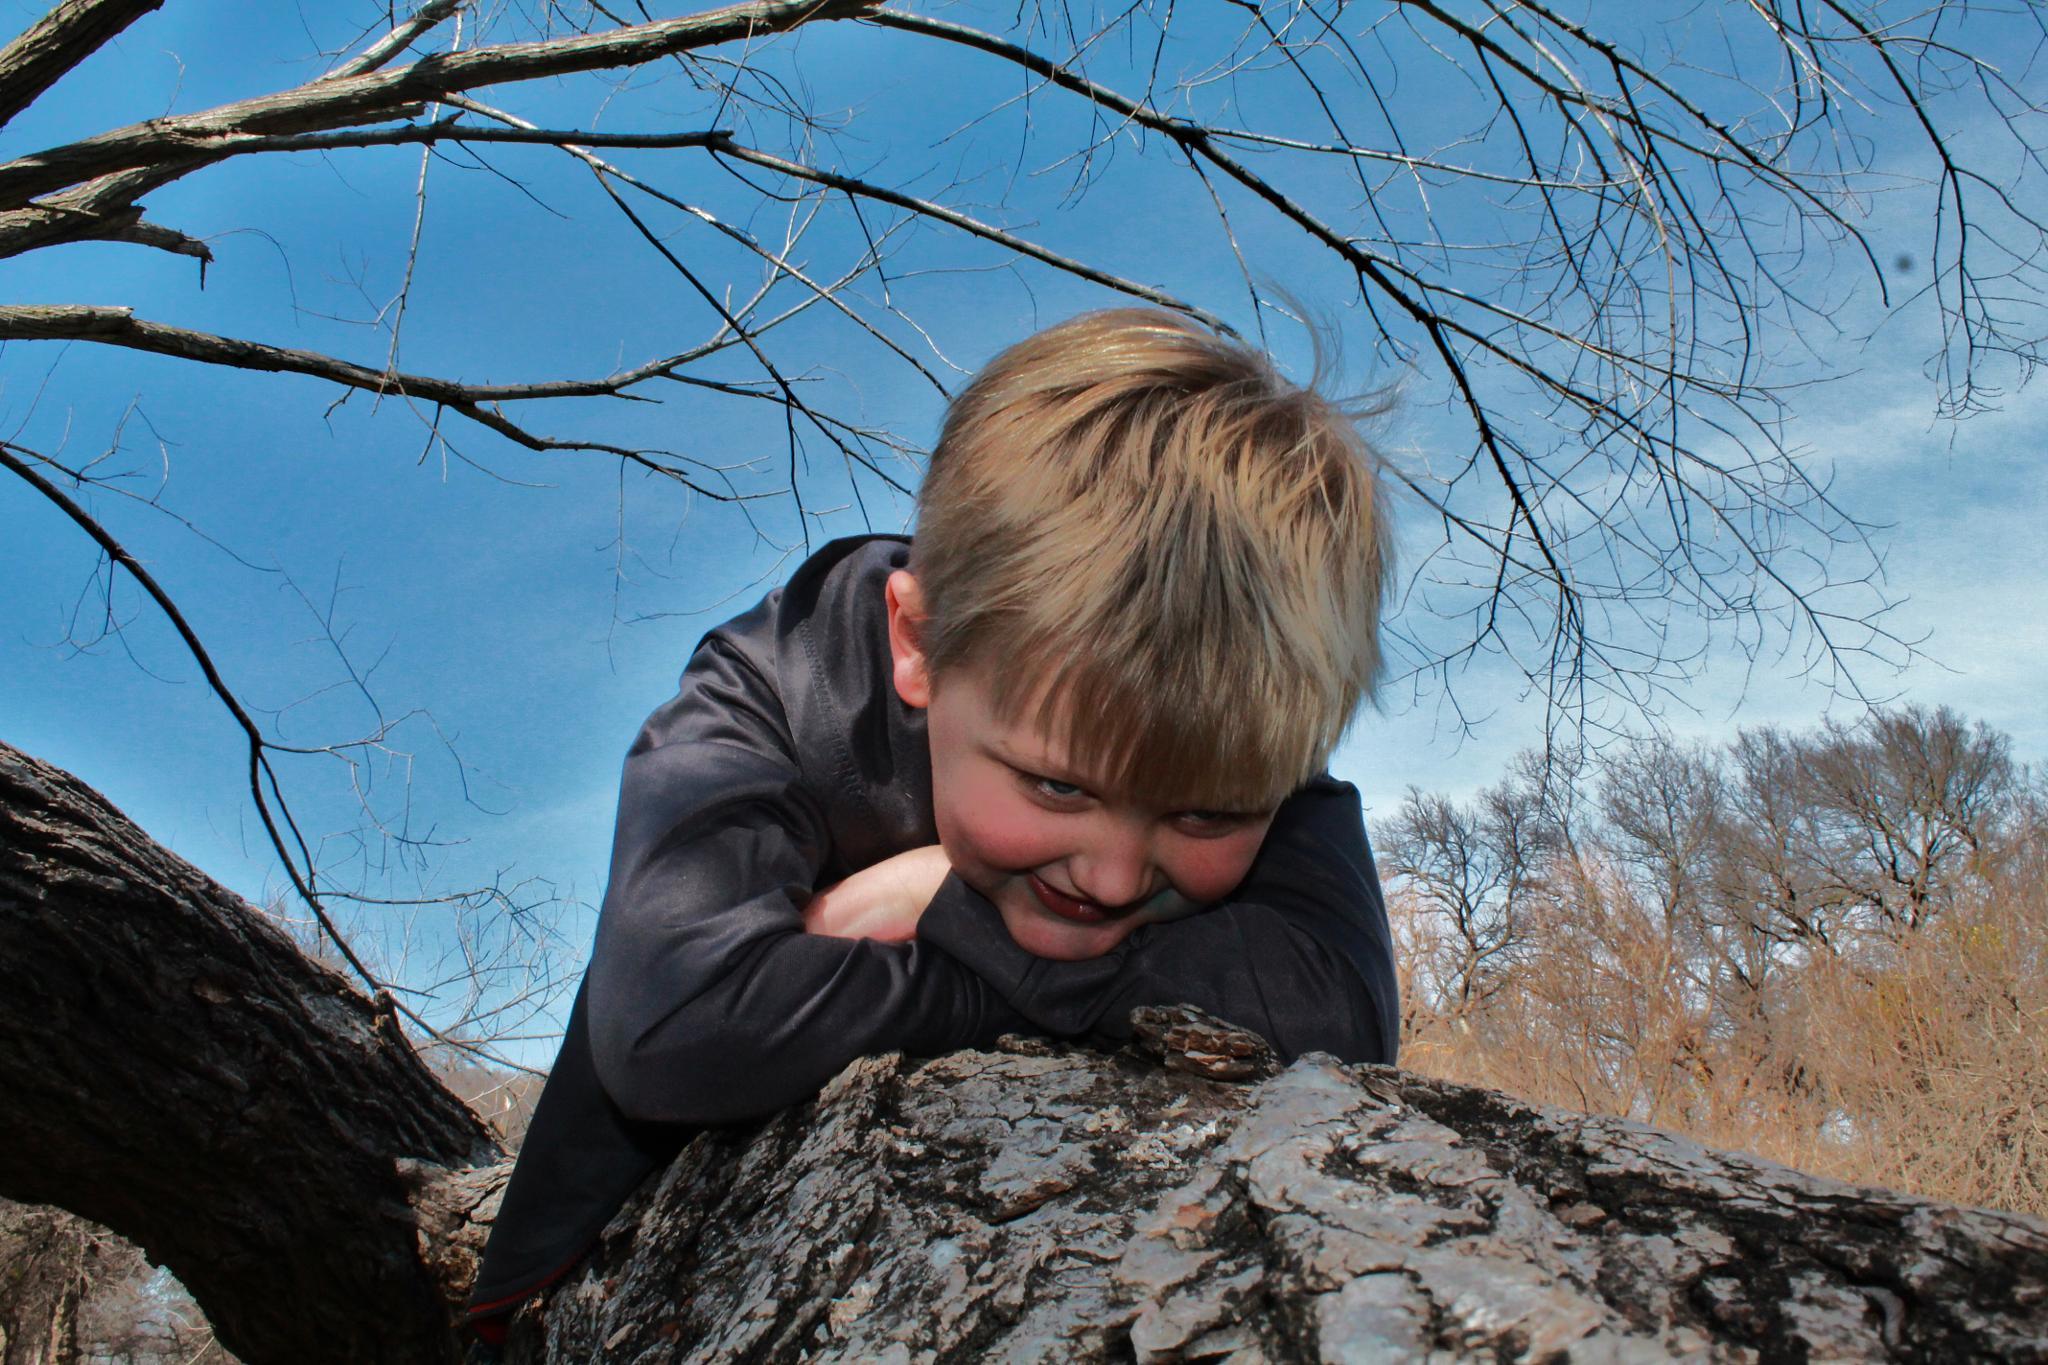 Boy on Tree by Patrick.D.Wentworth